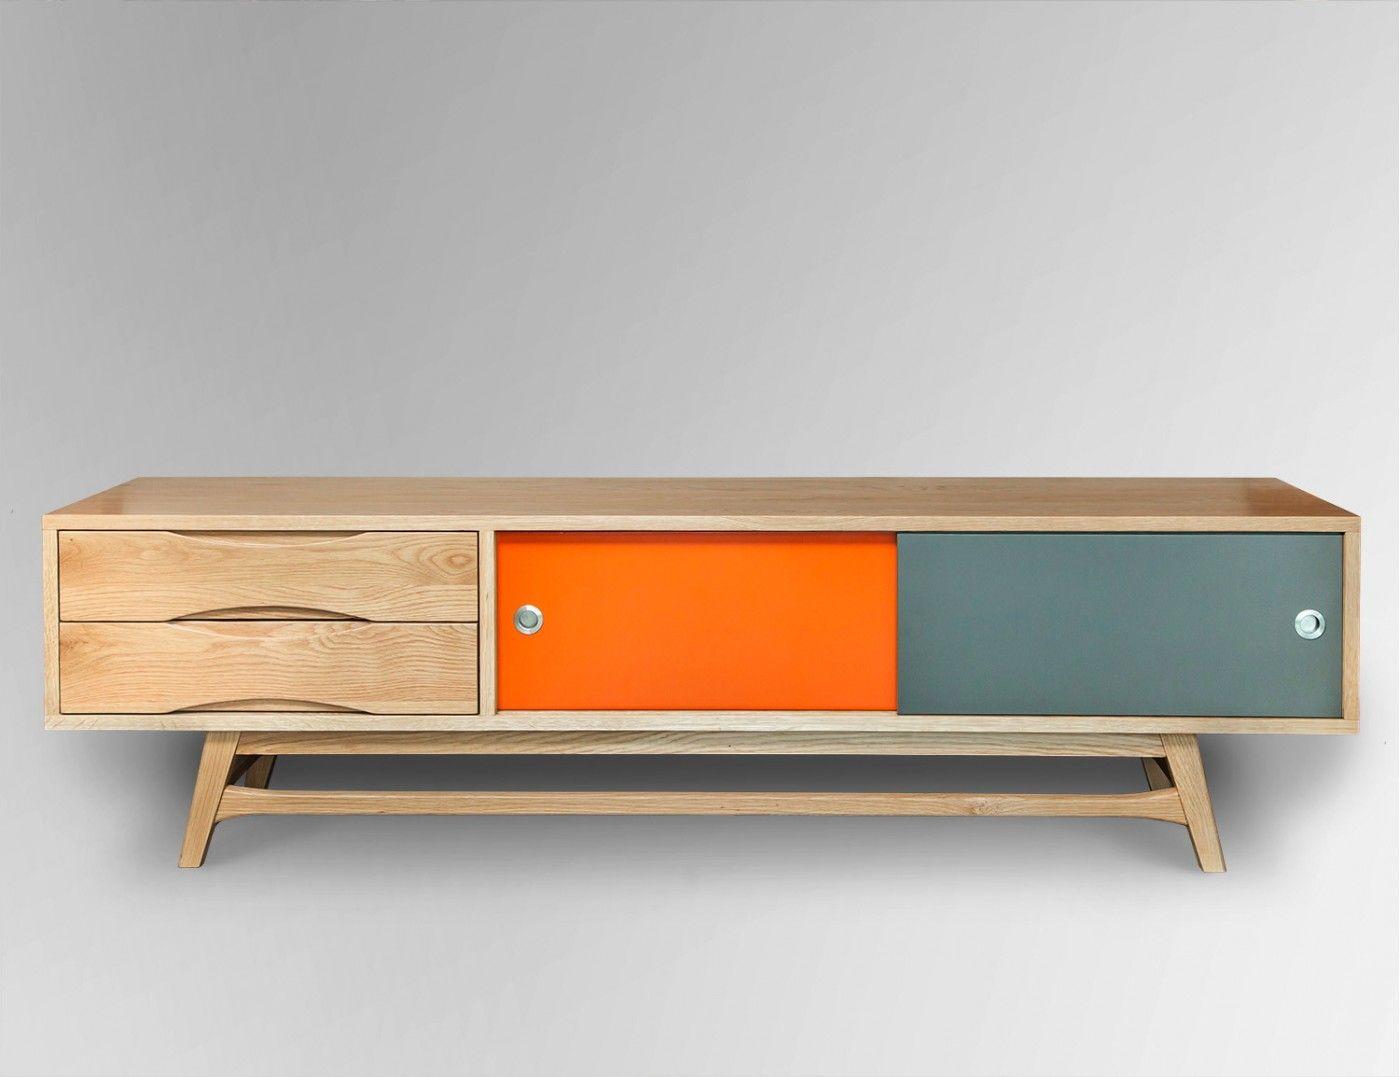 Sixty Tv Cabinet Desain Furnitur Kayu Rak